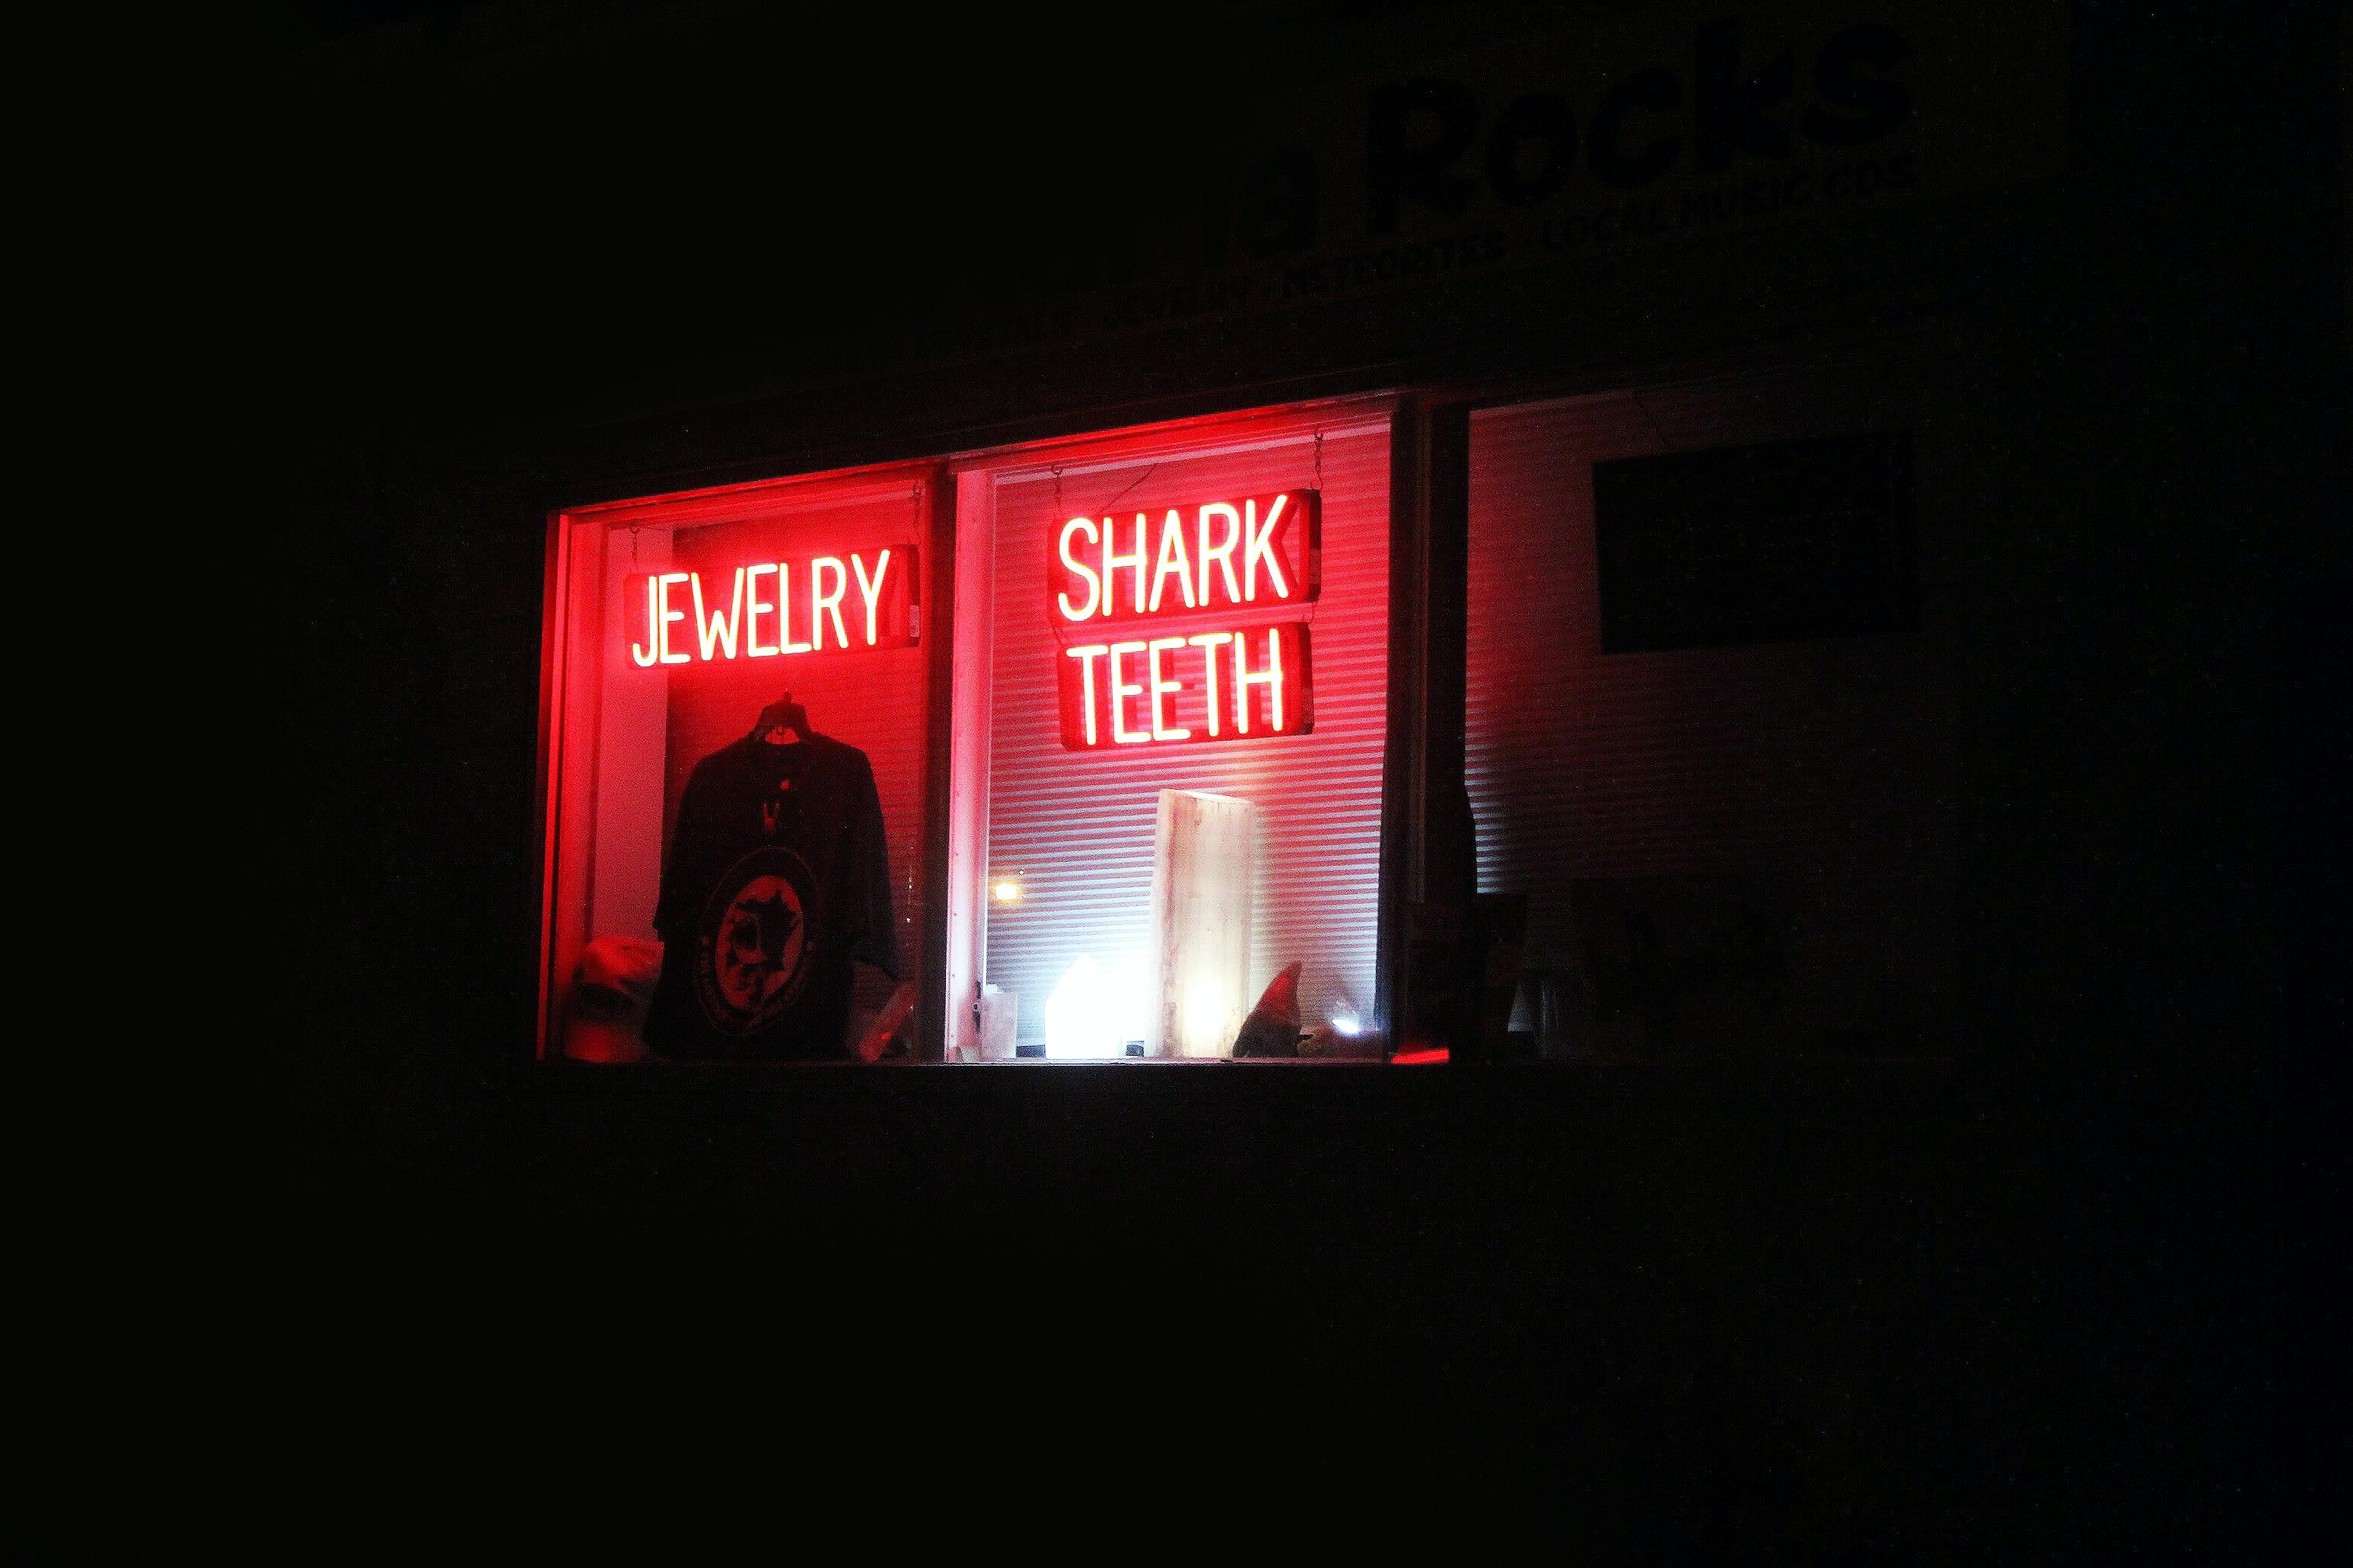 Shark Teeth neon signage on glass window